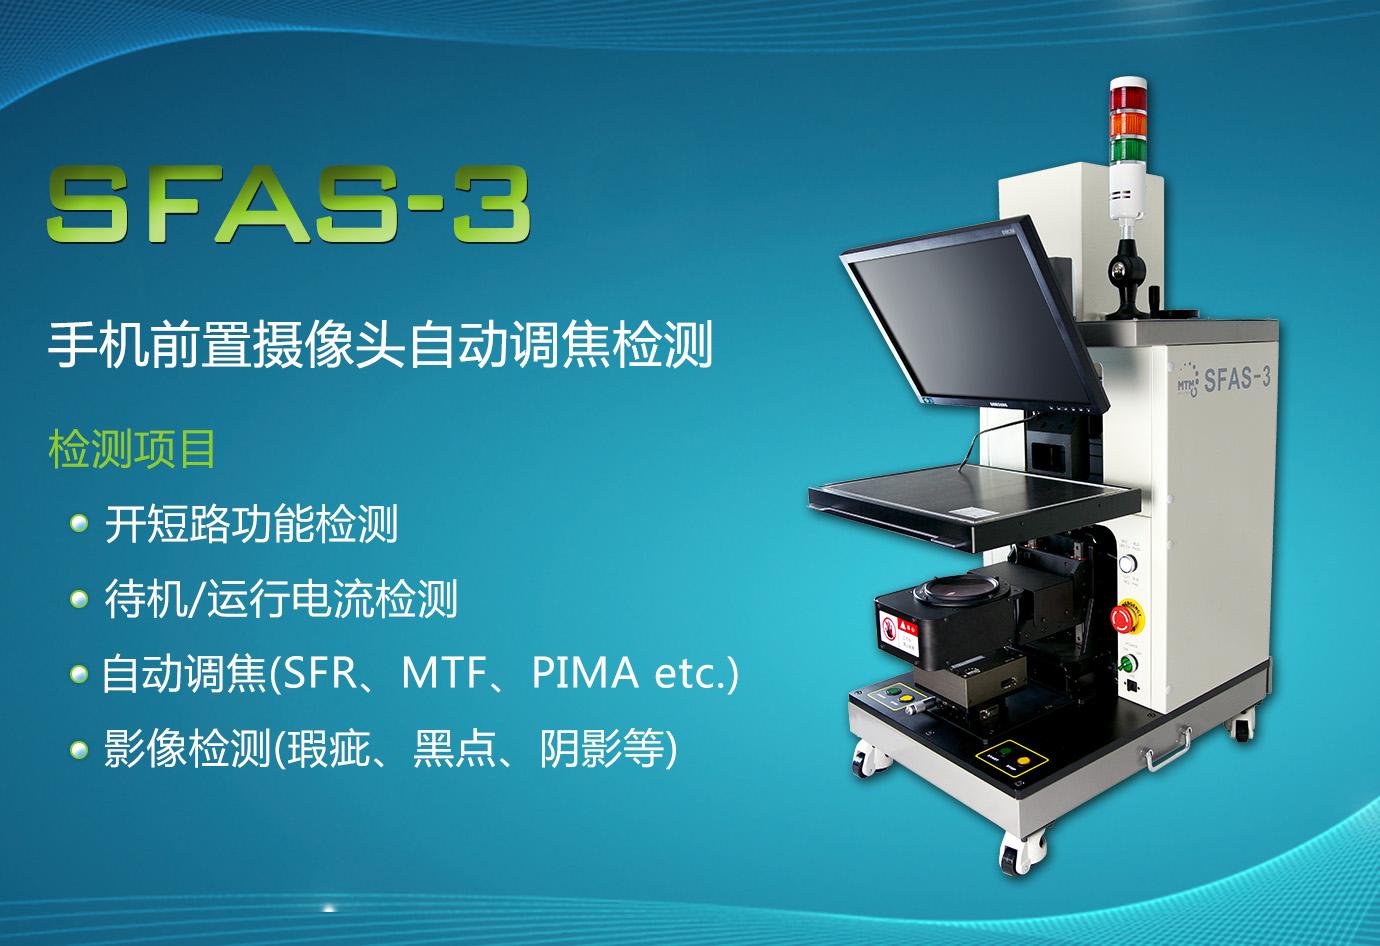 SFAS-3